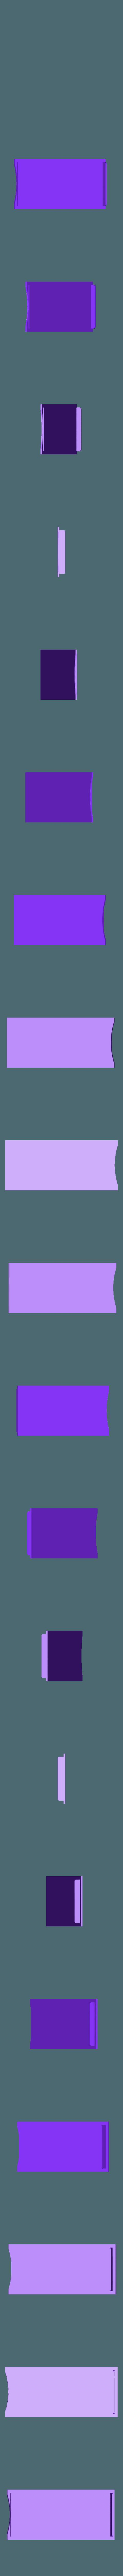 BoiteAClef-Couvercle.stl Download free STL file Magnetic Key Box • 3D printer design, fred6b12